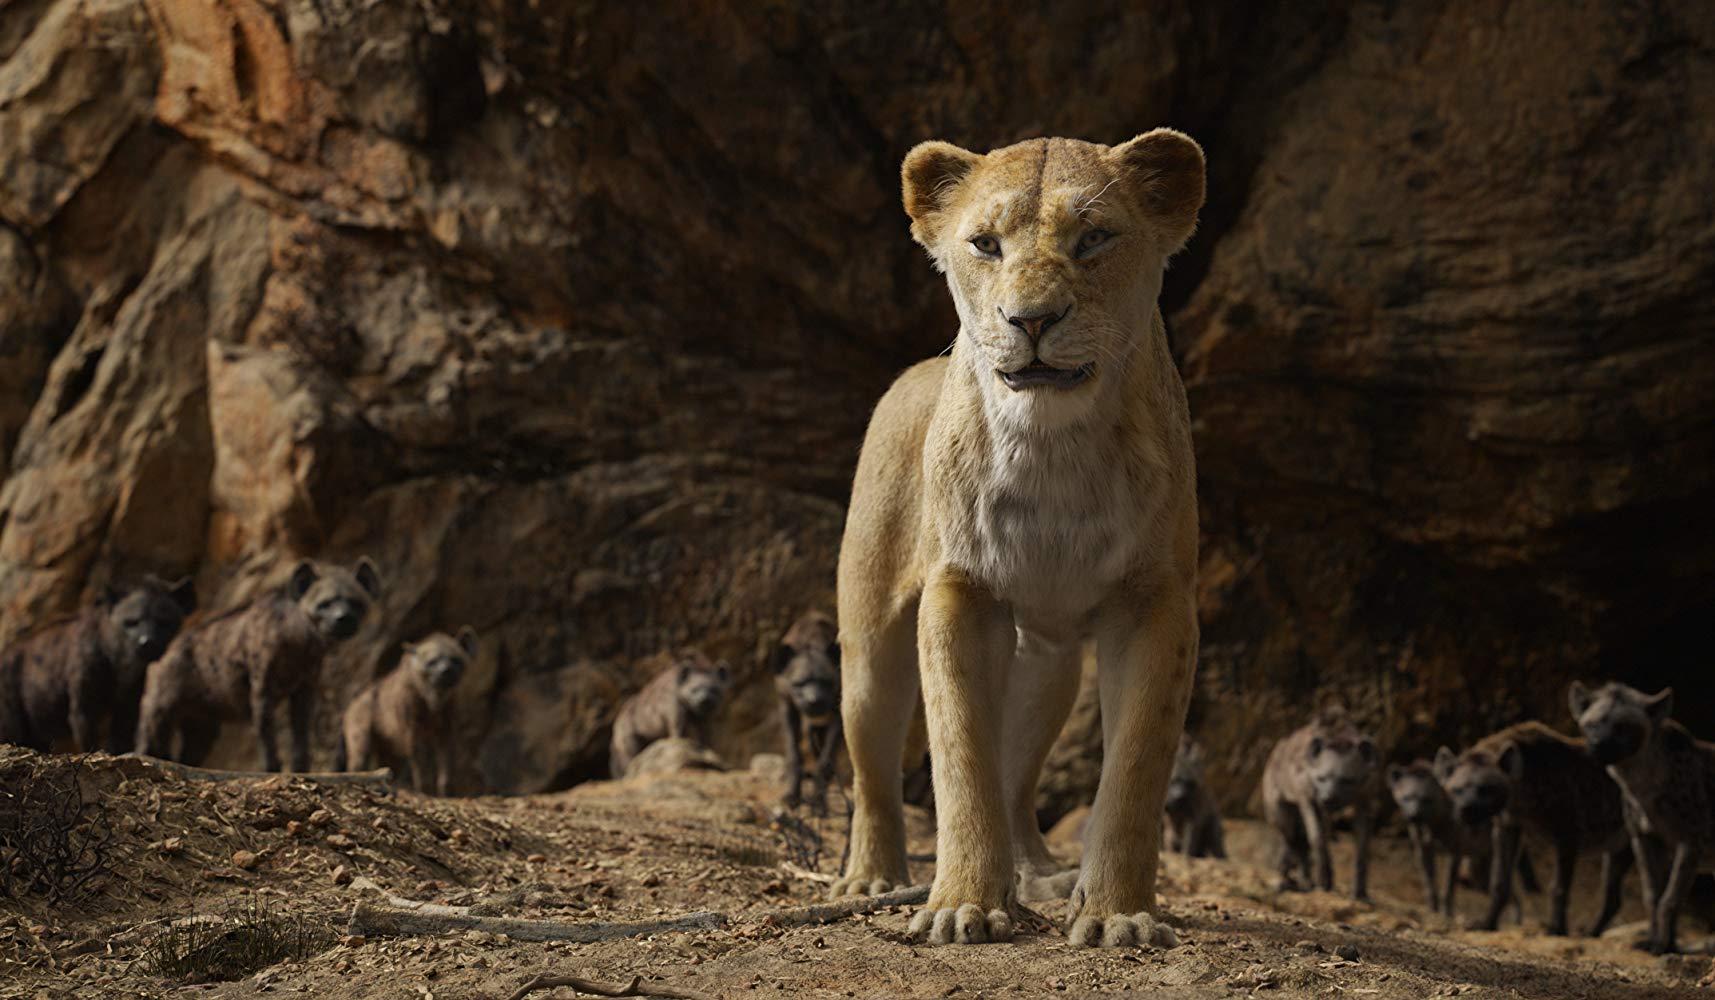 REVIEW##] The Lion King (2019) เดอะ ไลอ้อน คิง | งานภาพดี CG สวย แต่อ่อนระทวยเรื่องบท  [ไร้ส้มป่อย] - Pantip